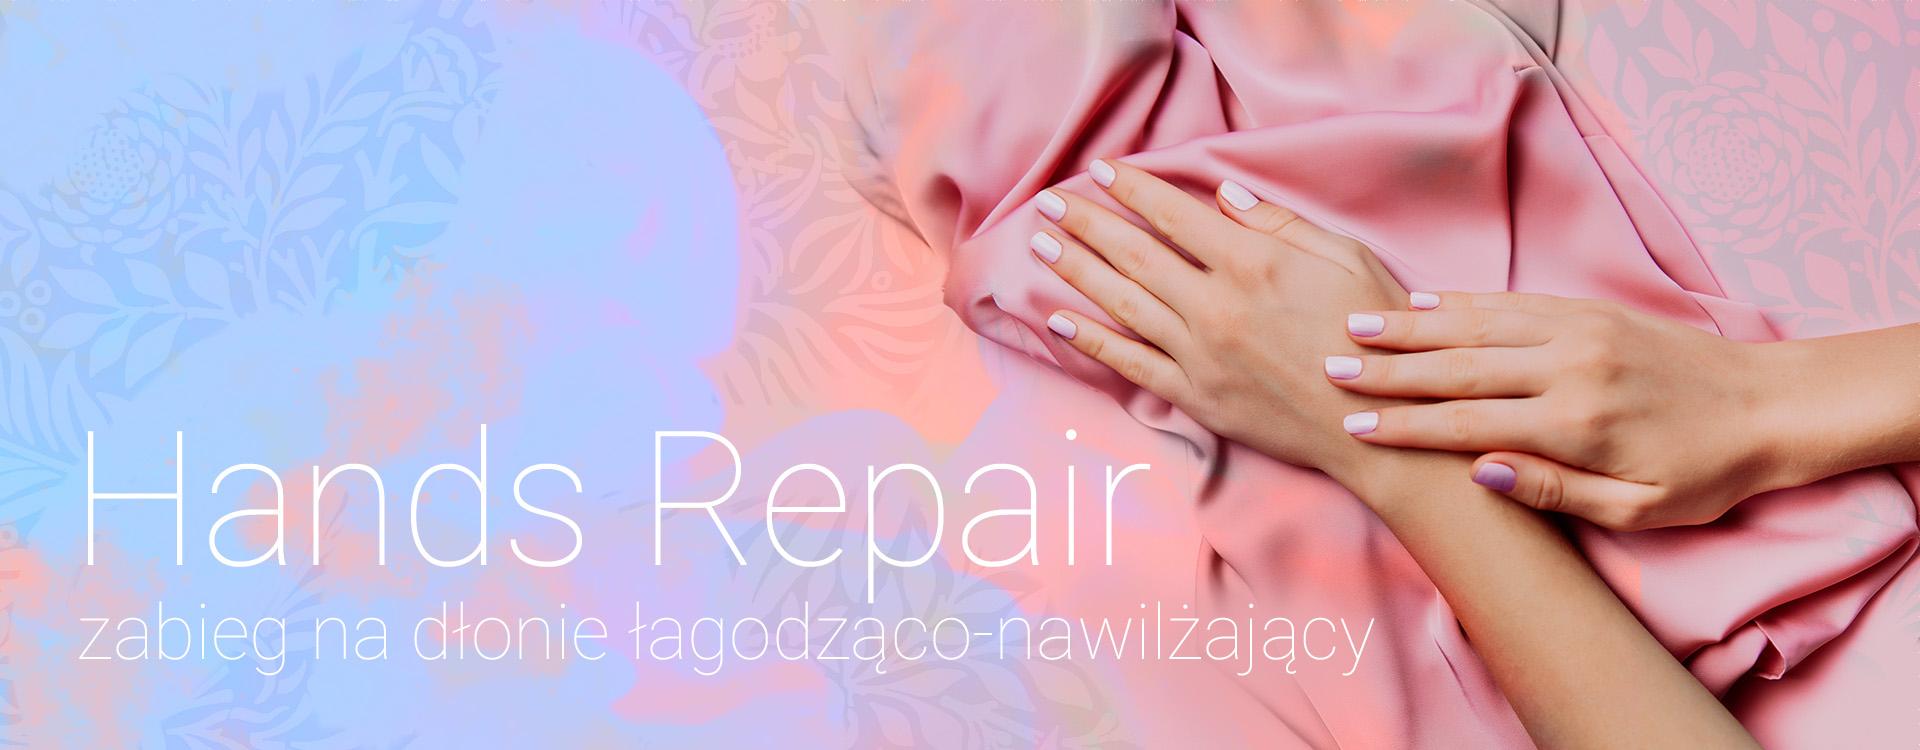 Hands repair zabiegi pielegnacyjne dłoni